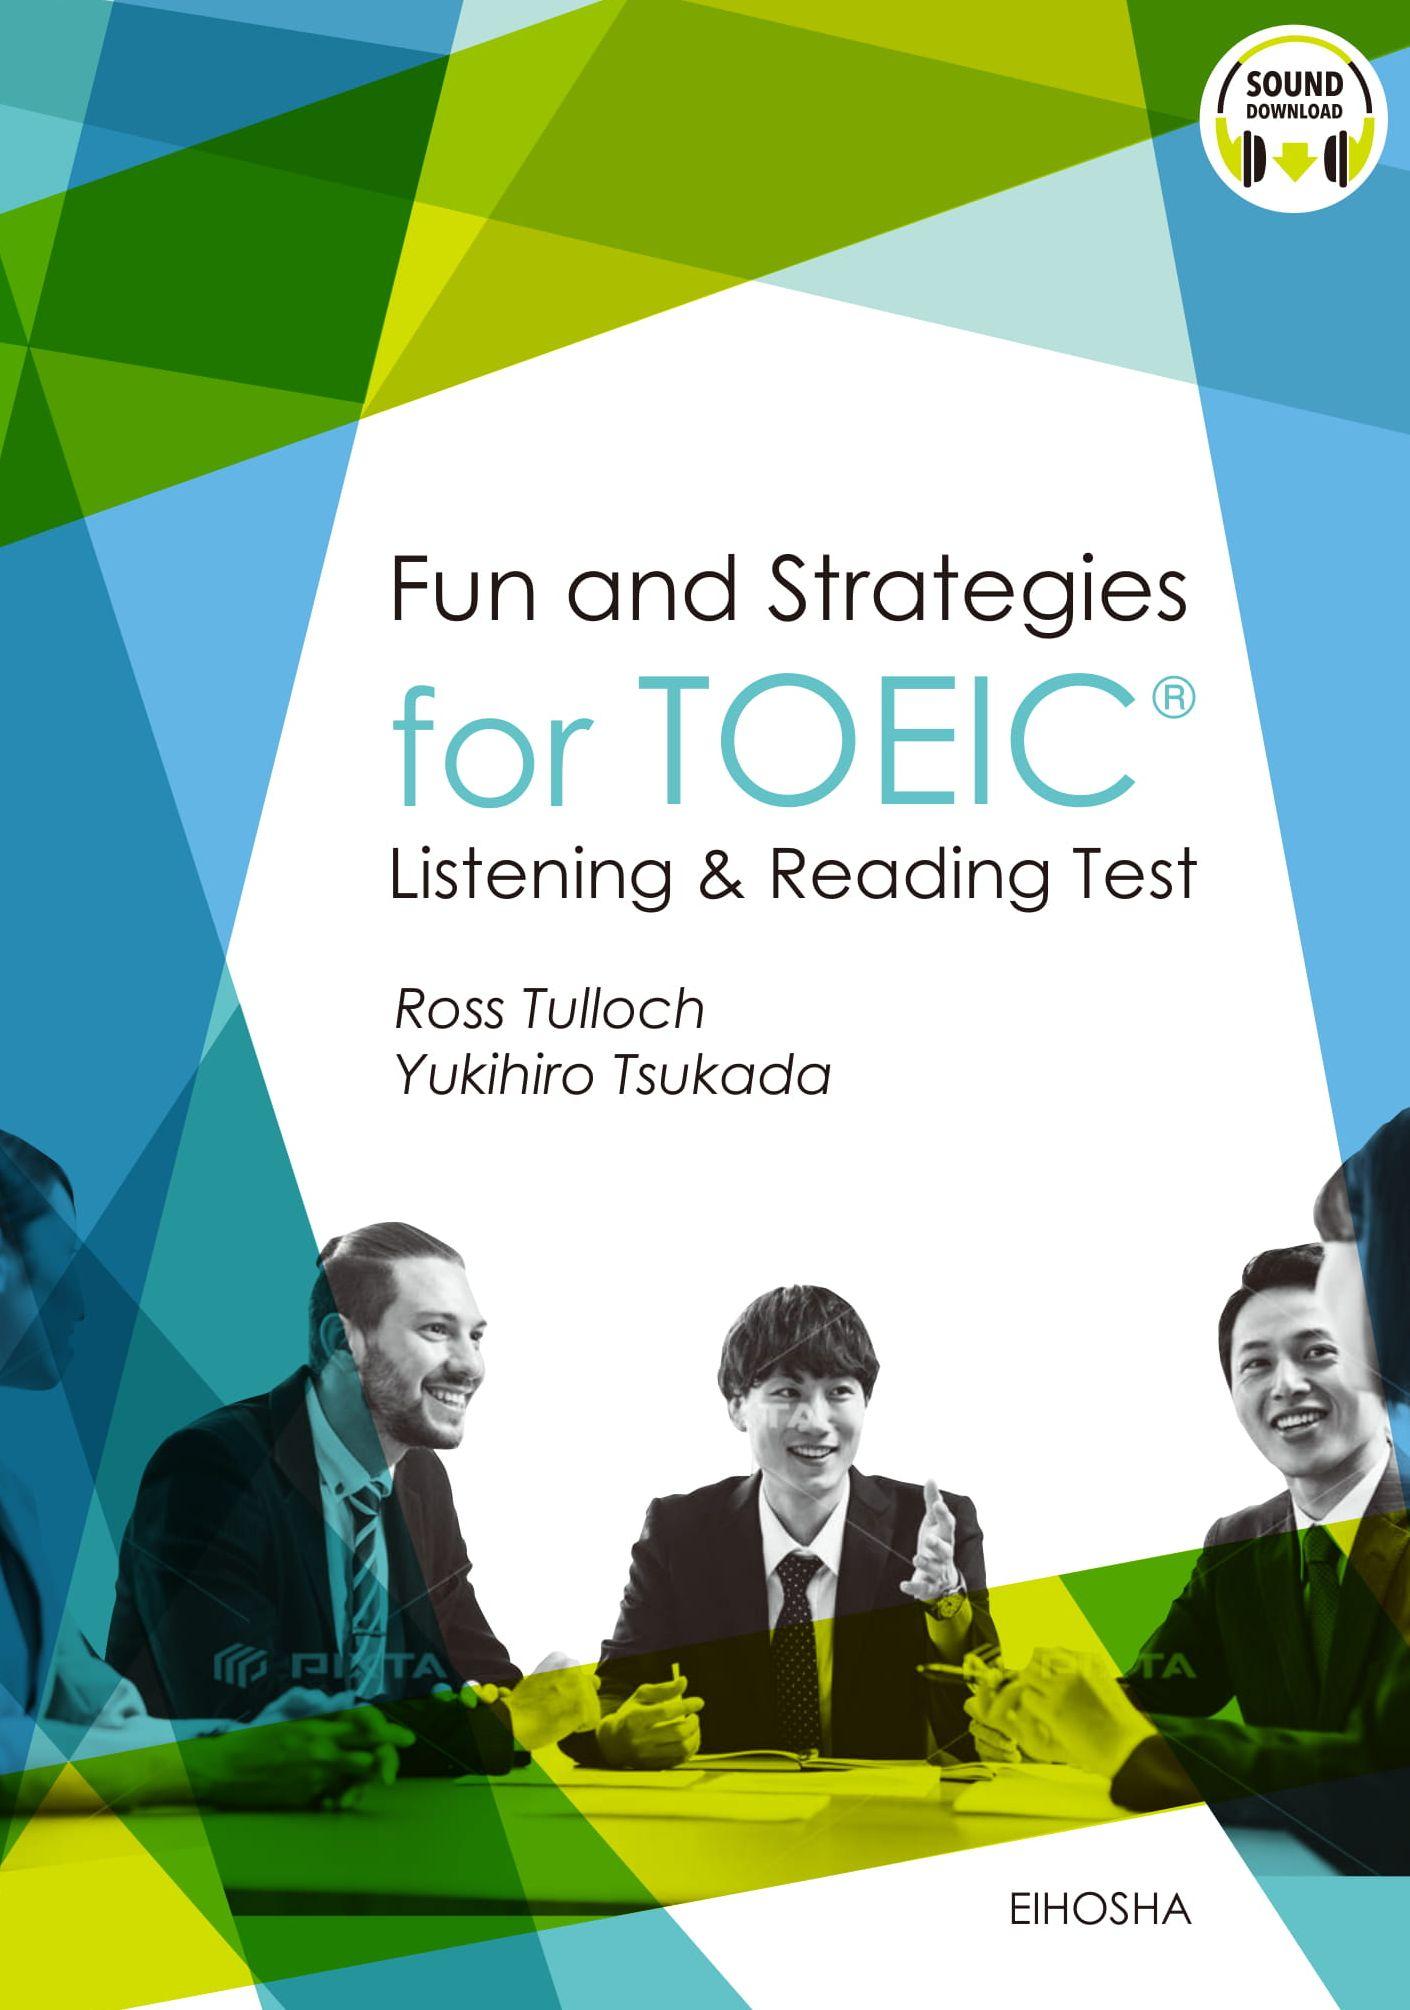 Tipsで攻略するTOEIC<sup>®</sup> L&Rテスト